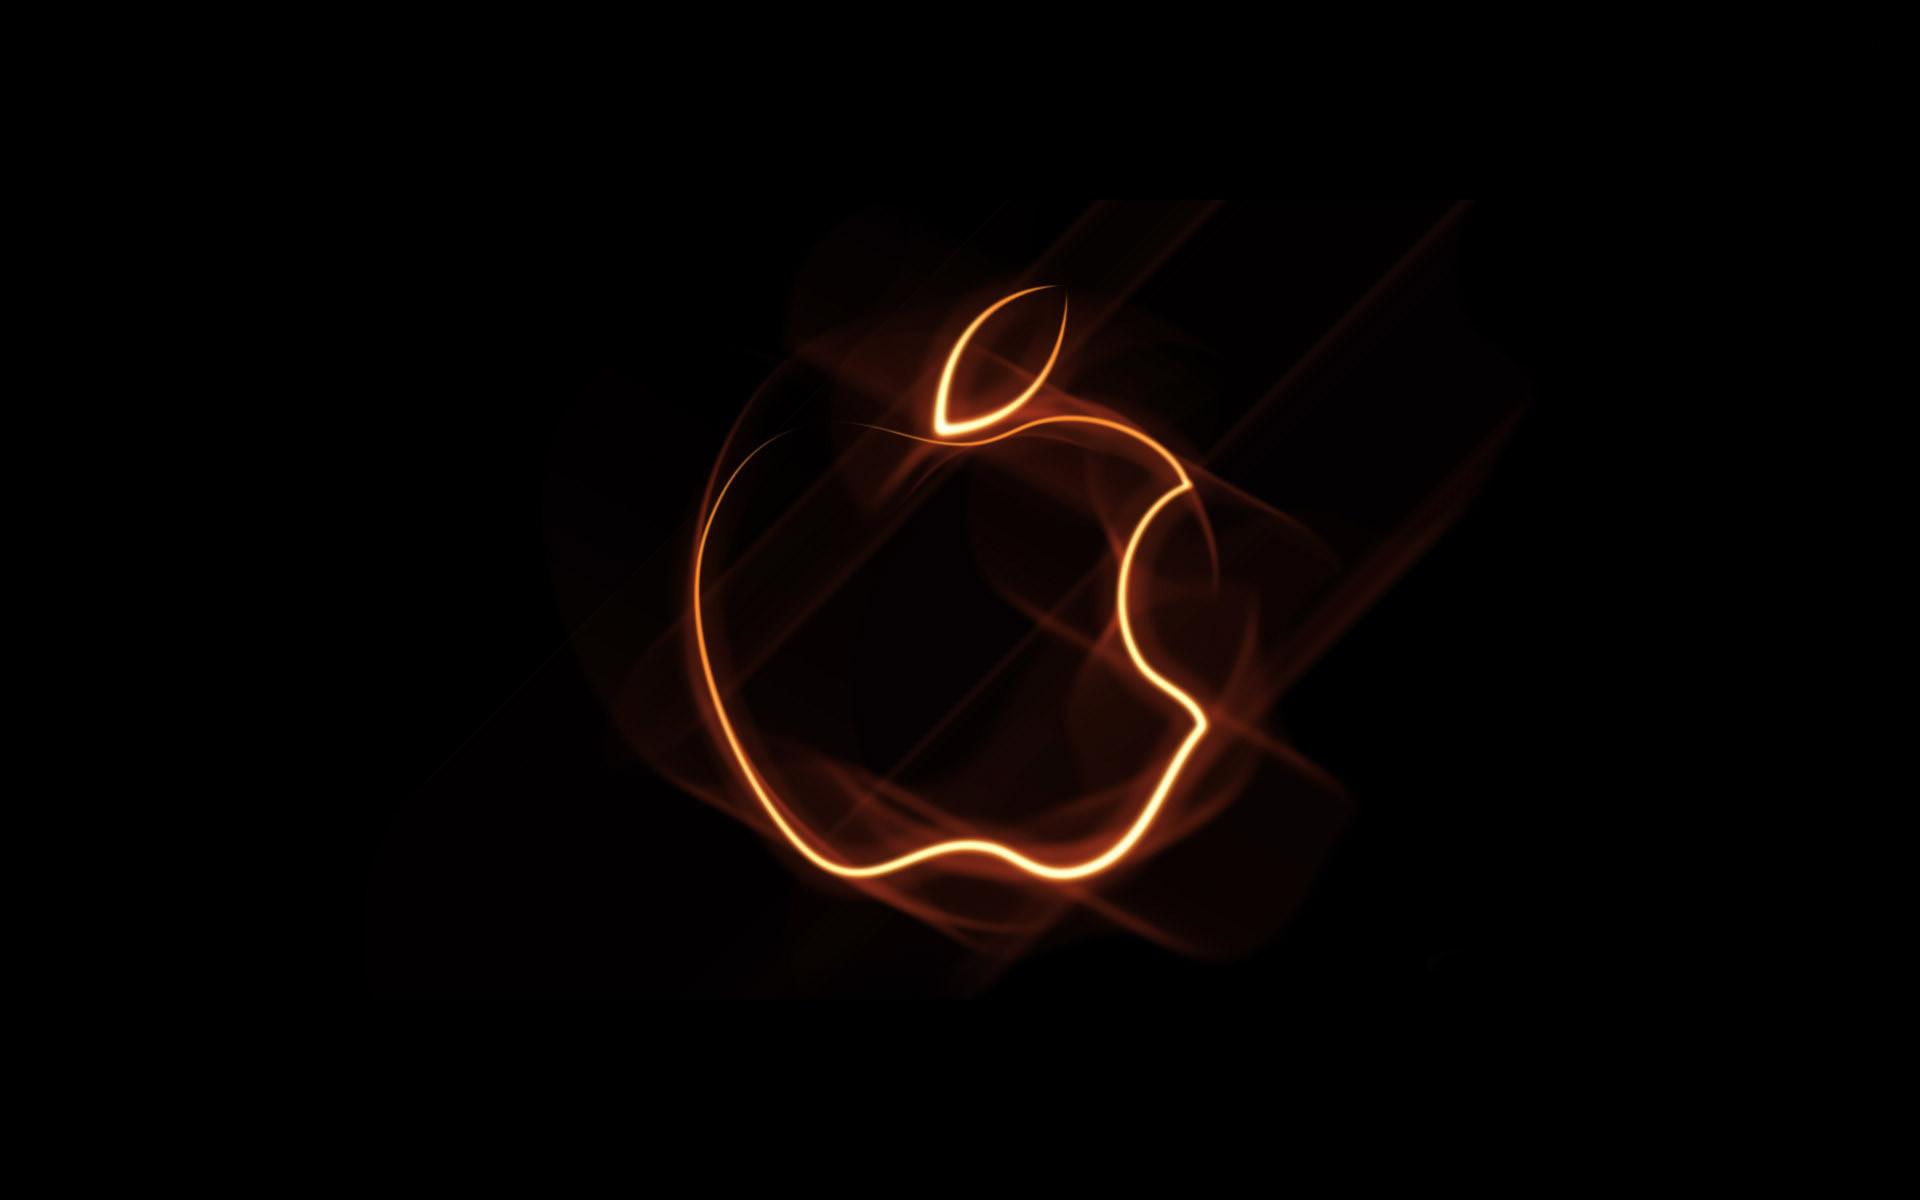 apple logo wallpaper wallpaper background hd apple sign 1920x1200